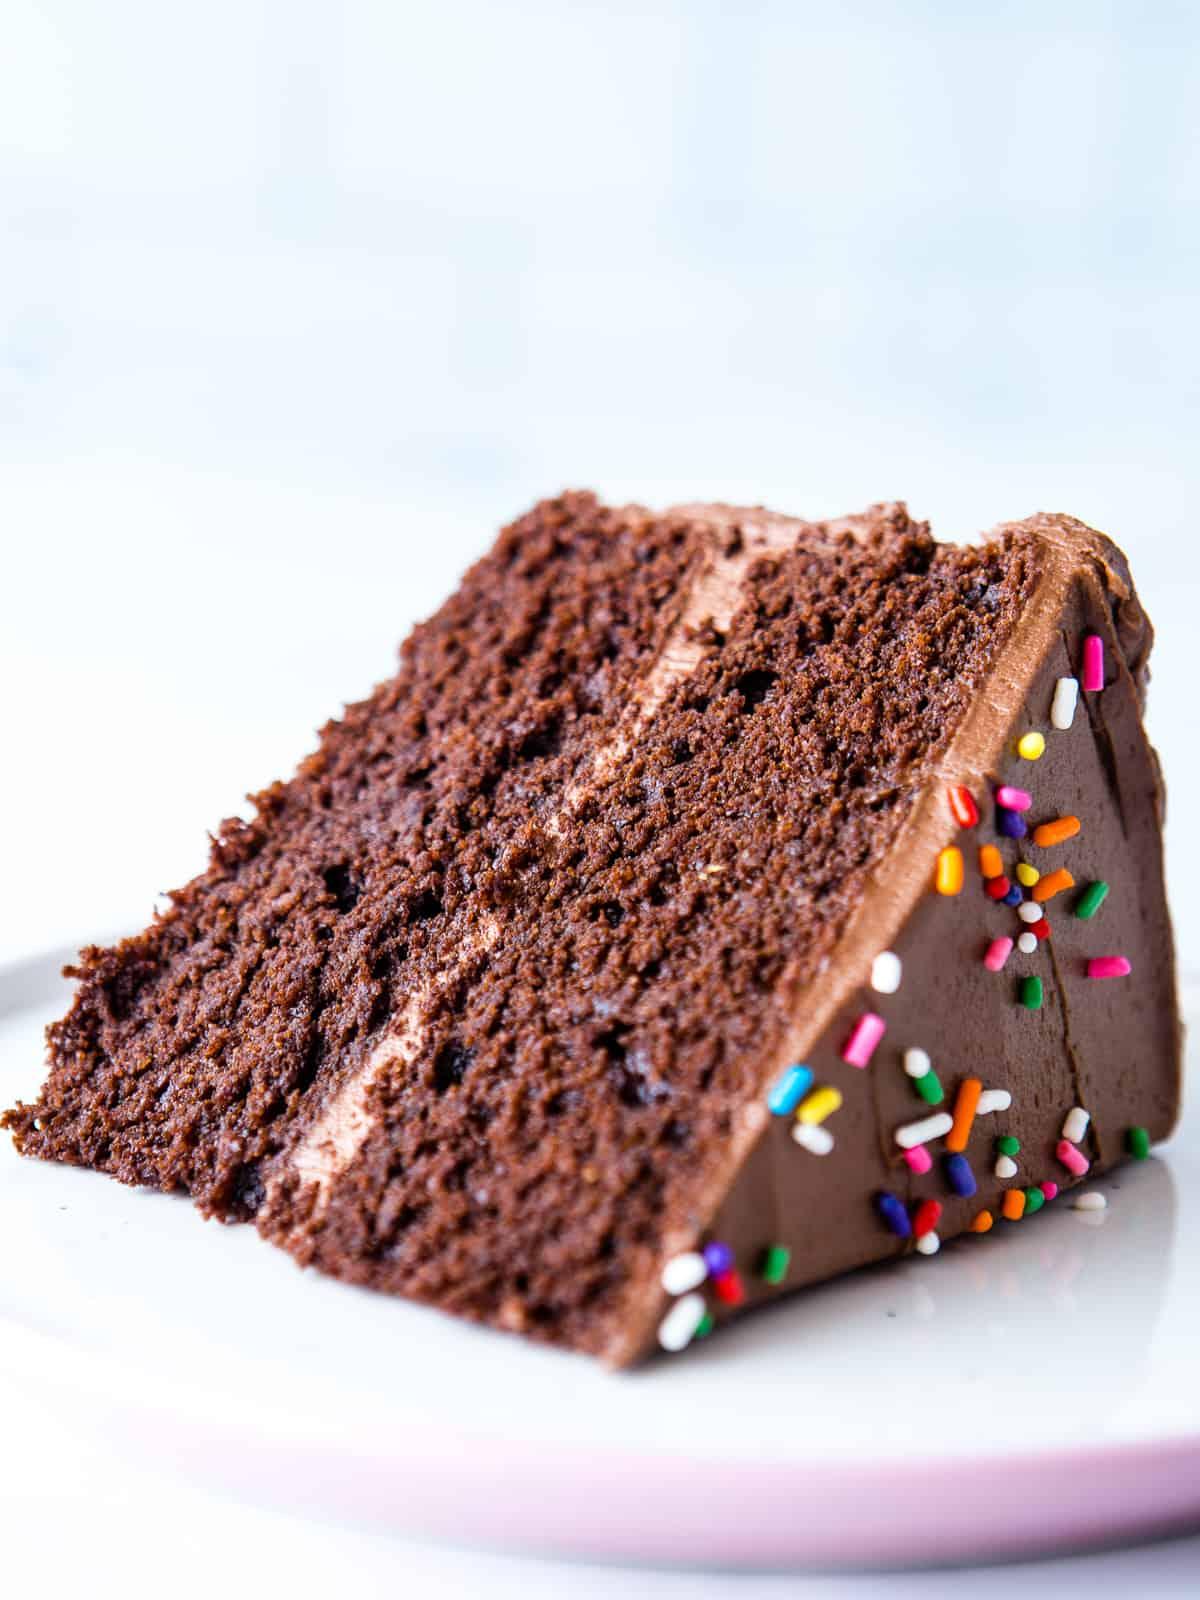 Slice of almond flour chocolate cake on a plate.